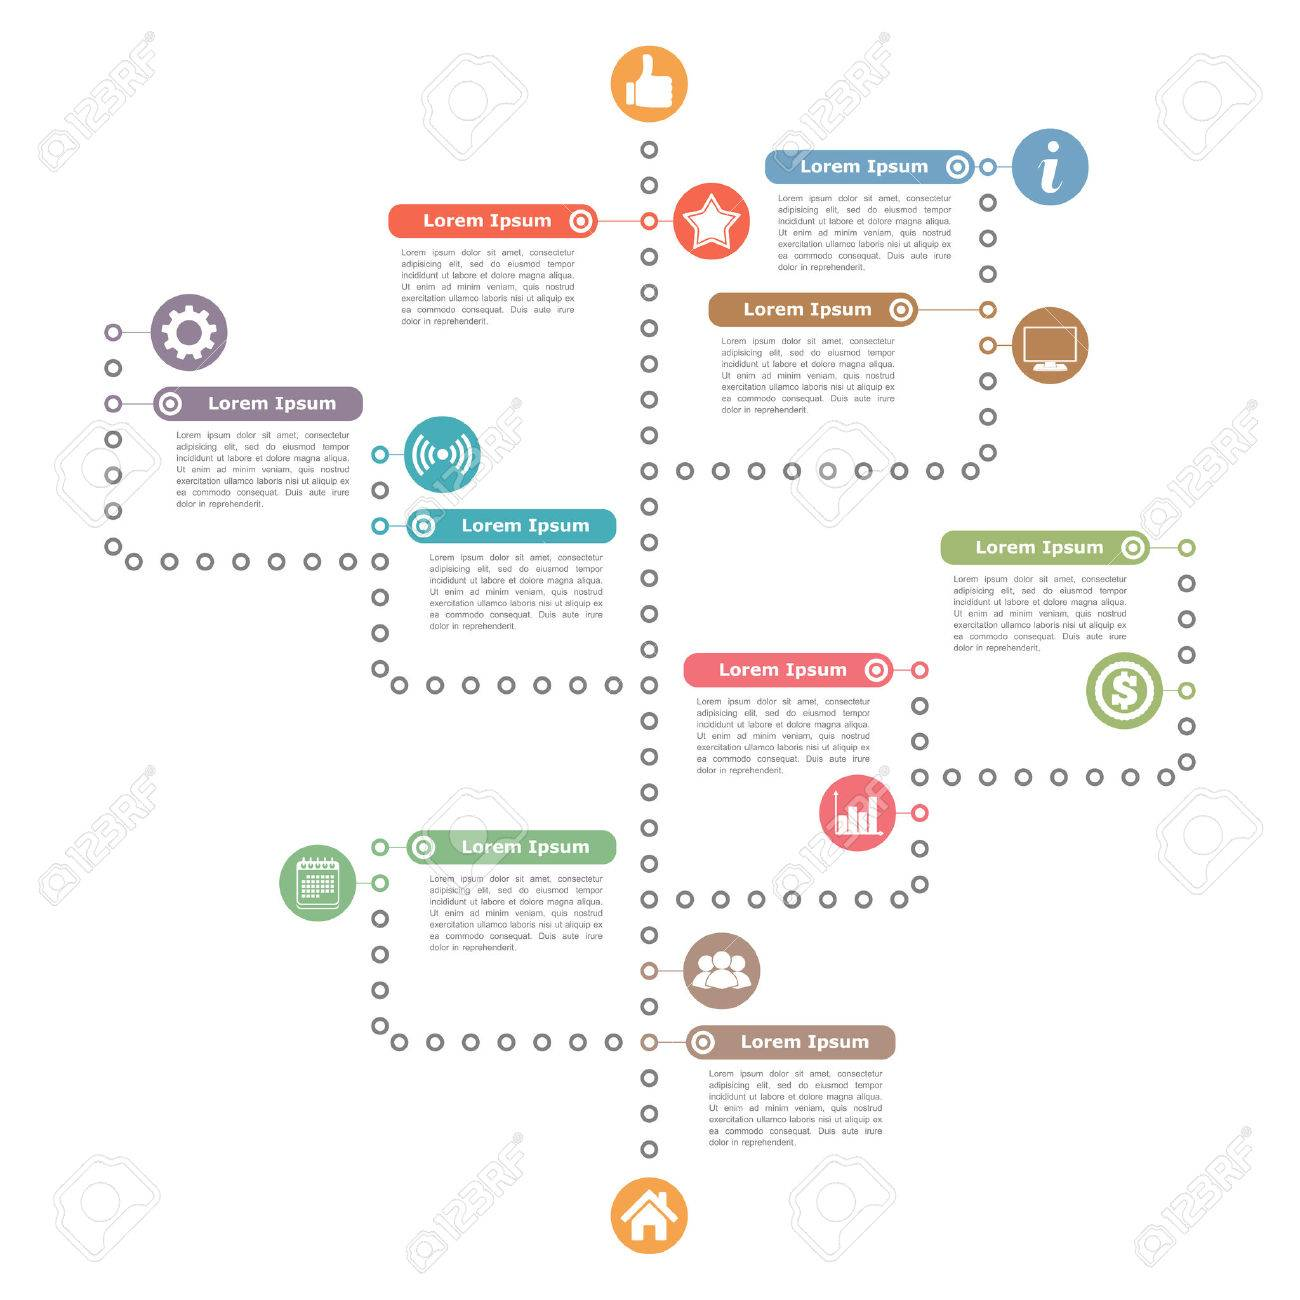 tree diagram template royalty free error code 51030, Wiring diagram